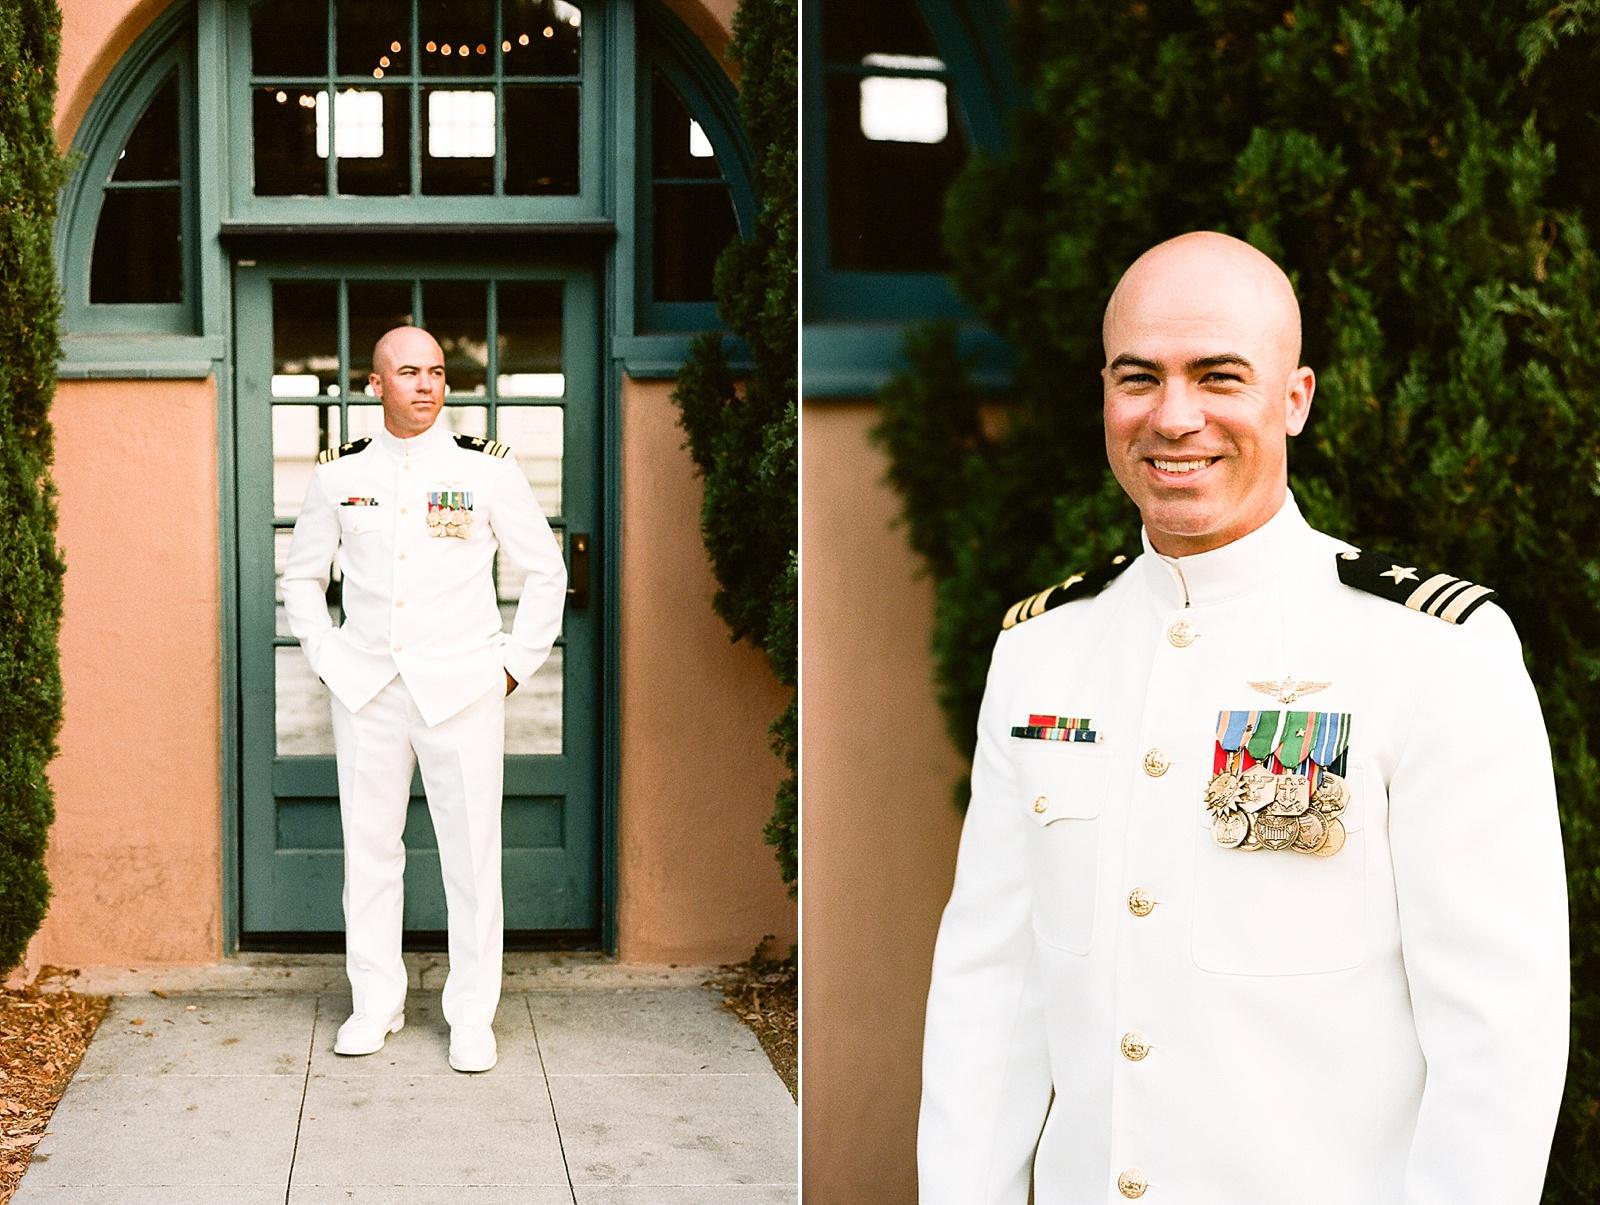 V&V Wedding at 828 by Lauren Nygard_film-026